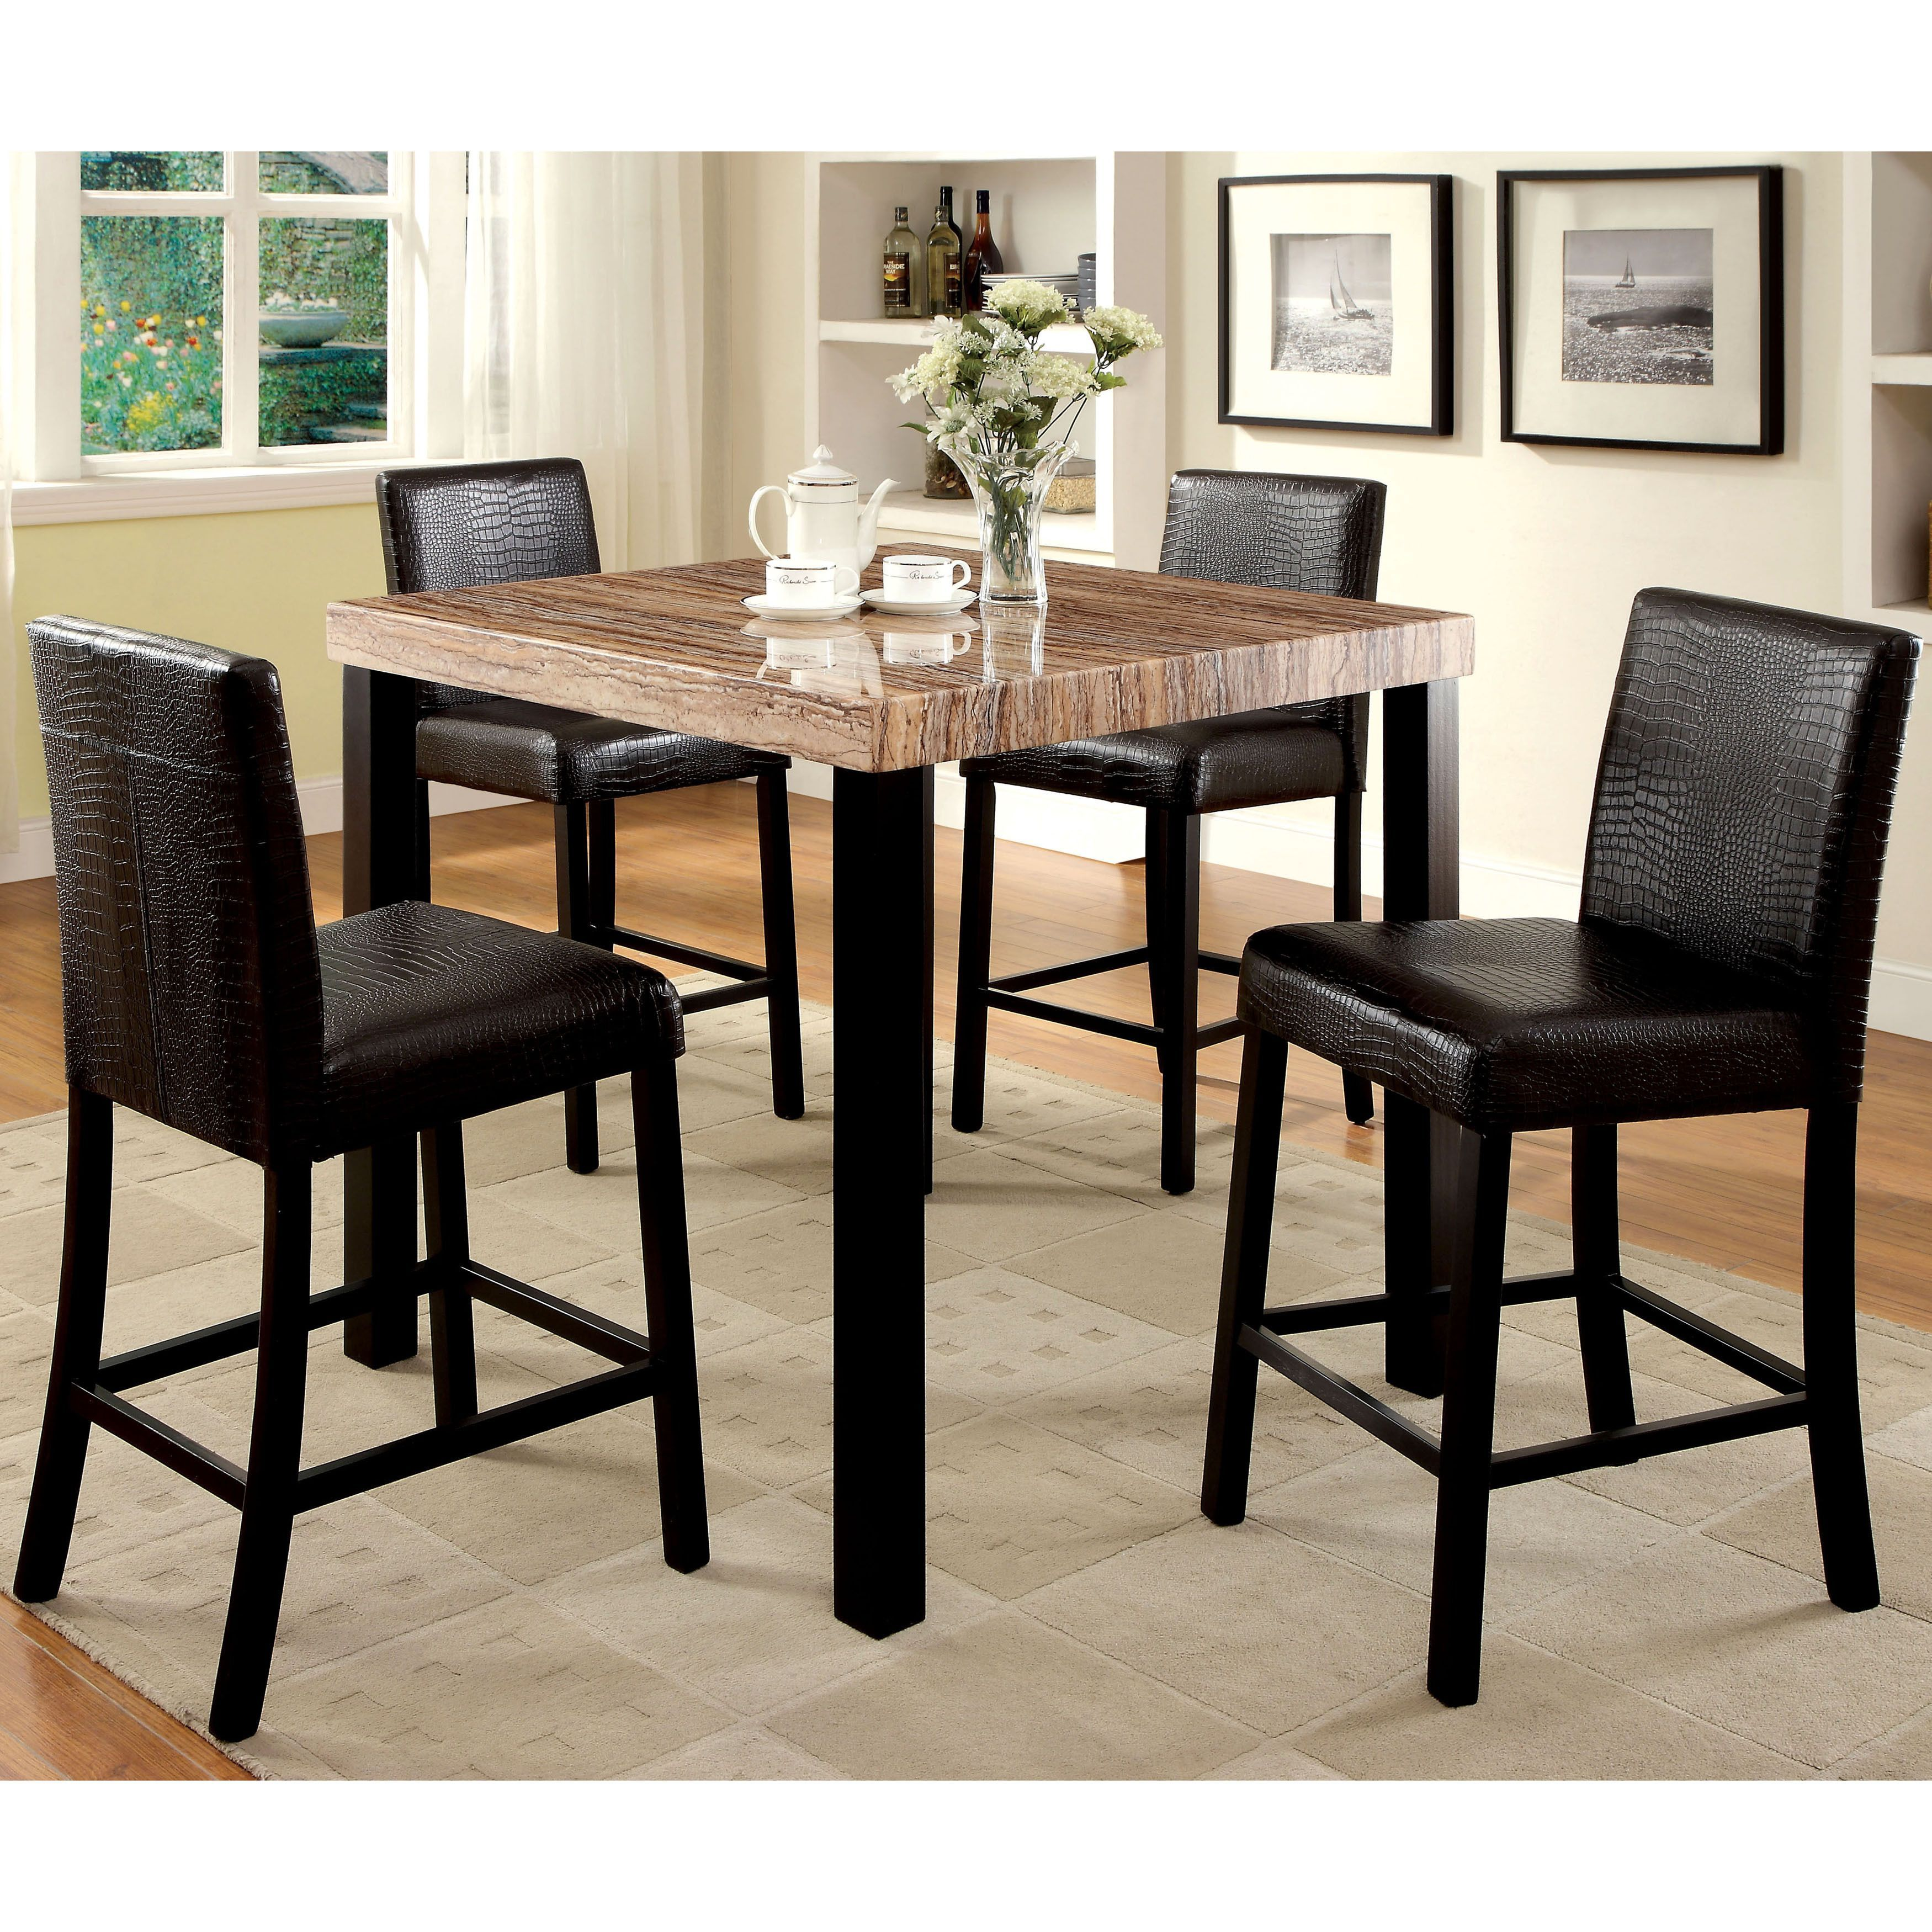 Kitchen bistro set  Furniture of America Dymen Contemporary Black piece Counter Height